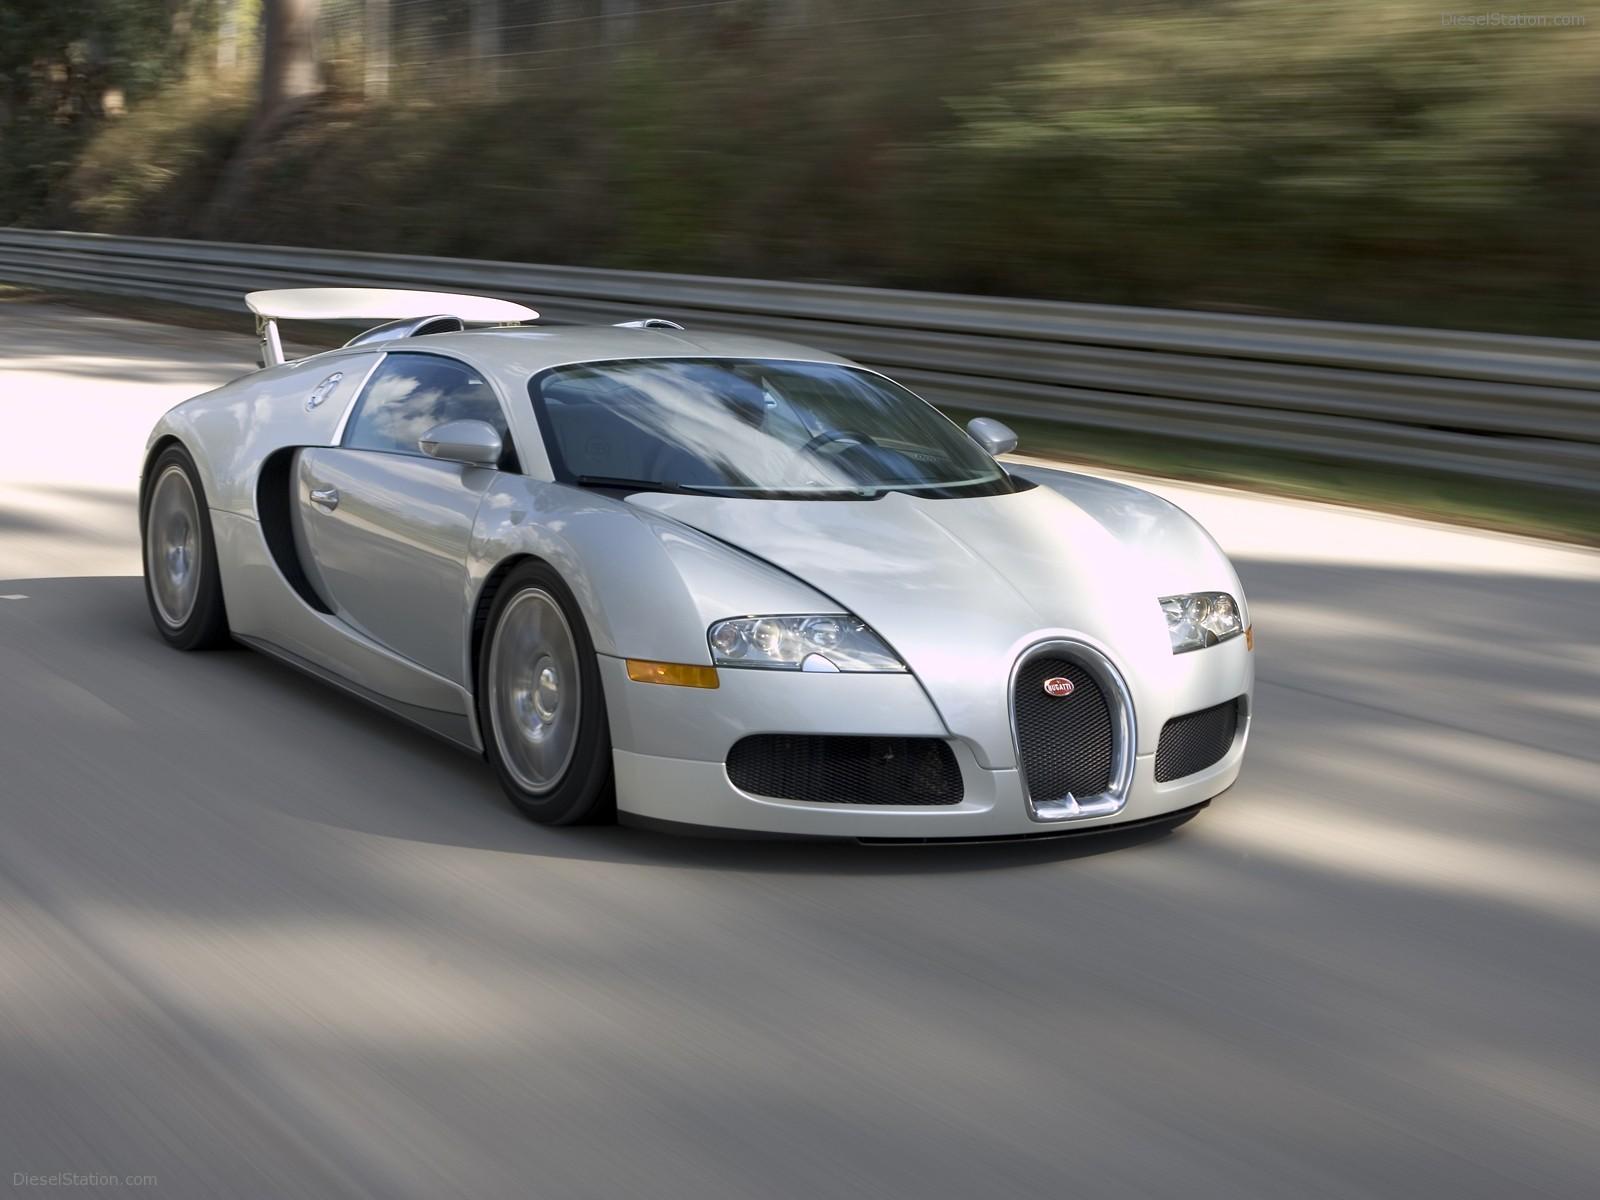 Bugatti Veyron Exotic Car Wallpaper 045 of 85 Diesel Station 1600x1200